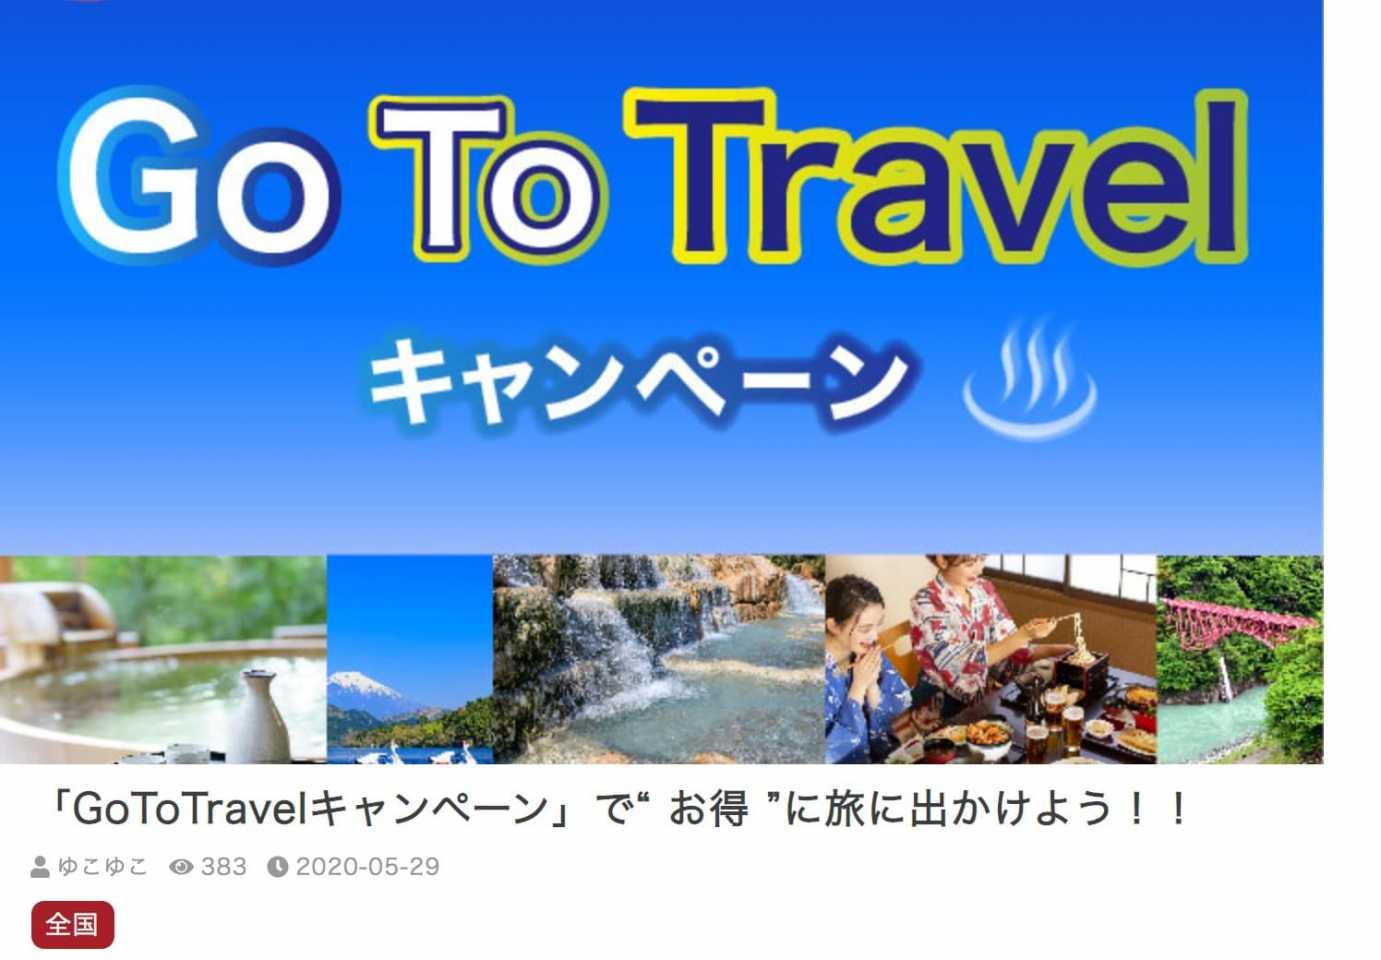 "「GoToTravelキャンペーン」で"" お得 ""に旅に出かけよう!!-ゆこたび - www.yukoyuko.net"